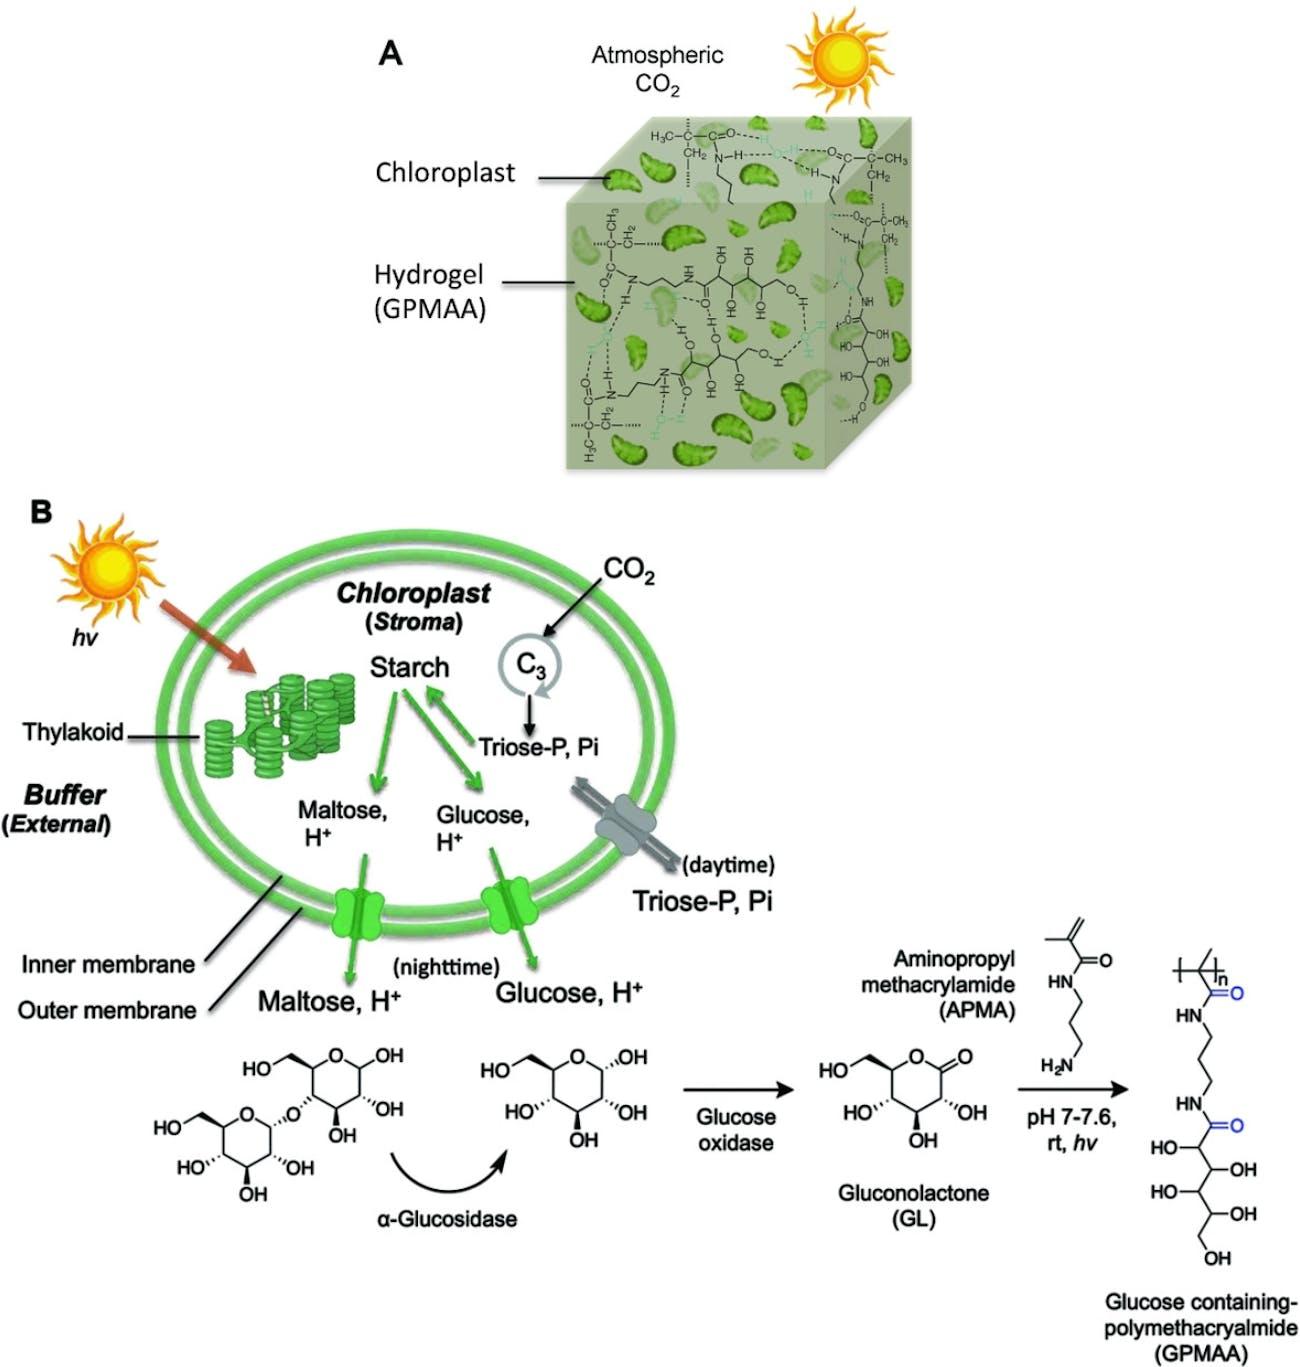 Diagram of molecular process and hydrogel